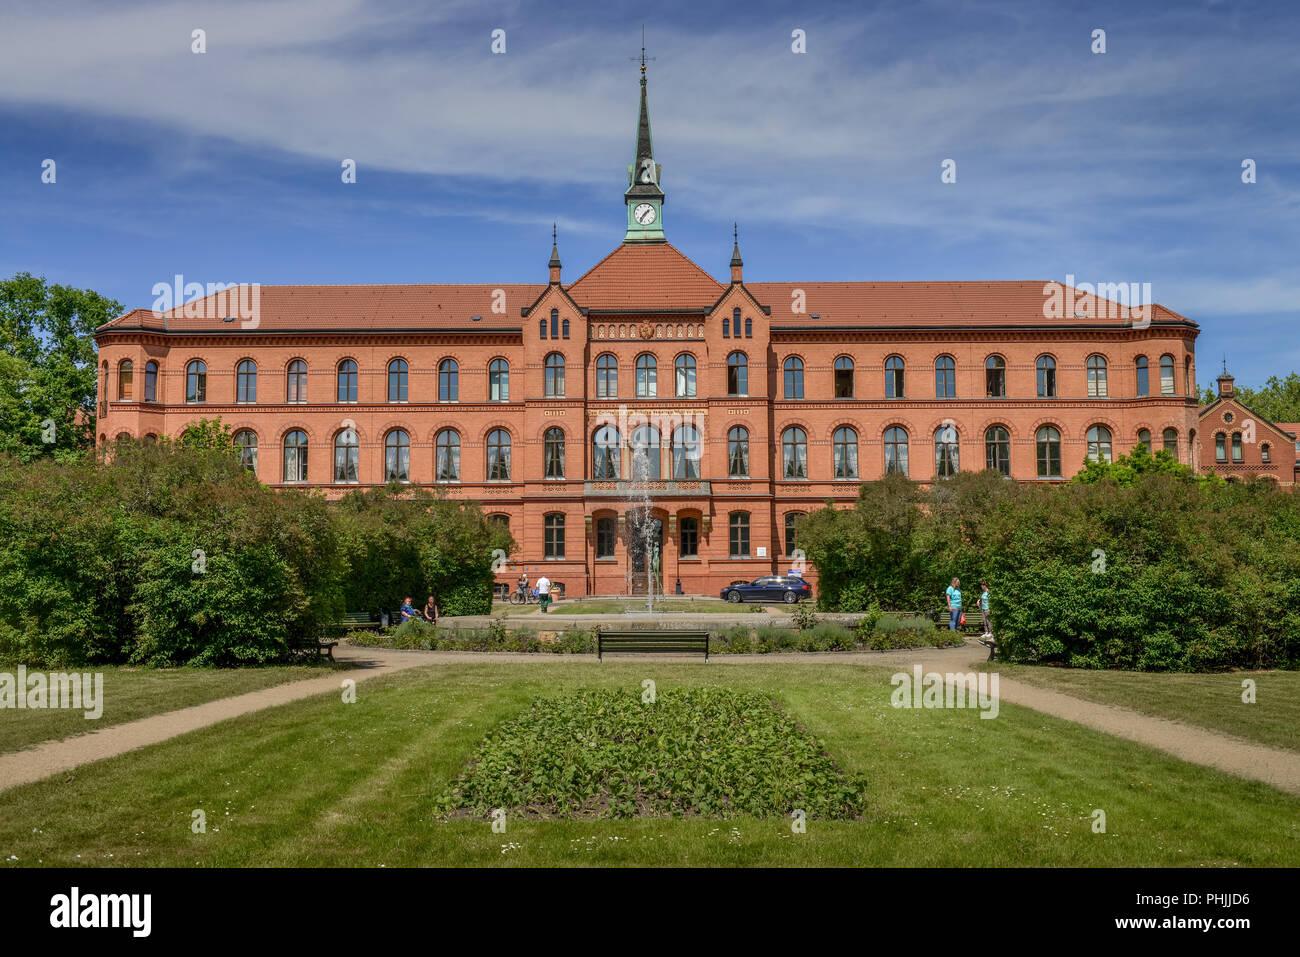 Krankenhaus Koenigin Elisabeth Herzberge Herzbergstrasse